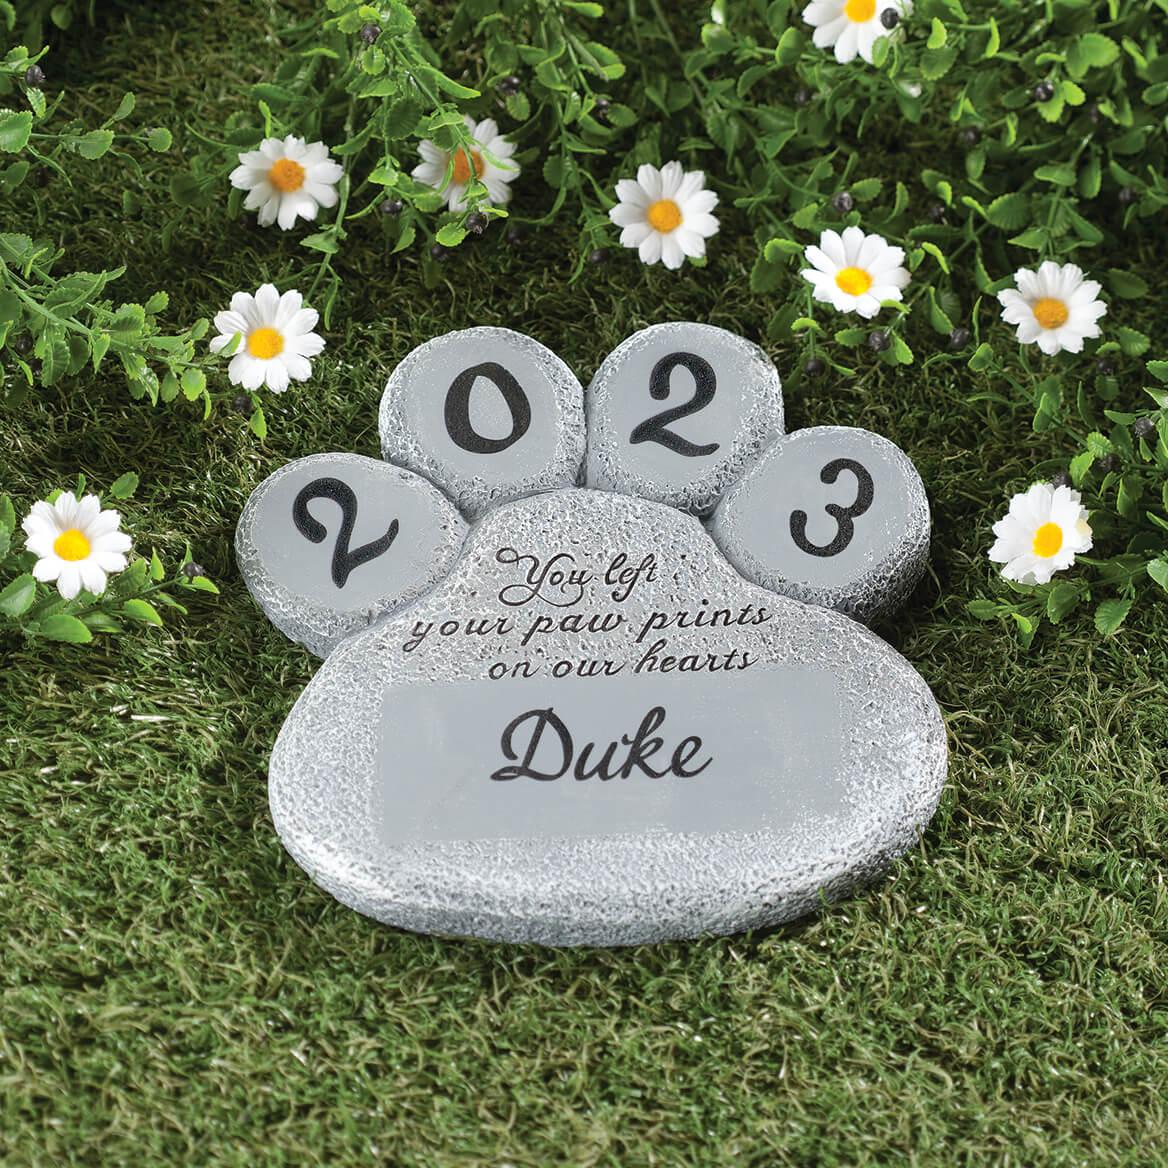 Personalized Pet Memorial Stone-355481